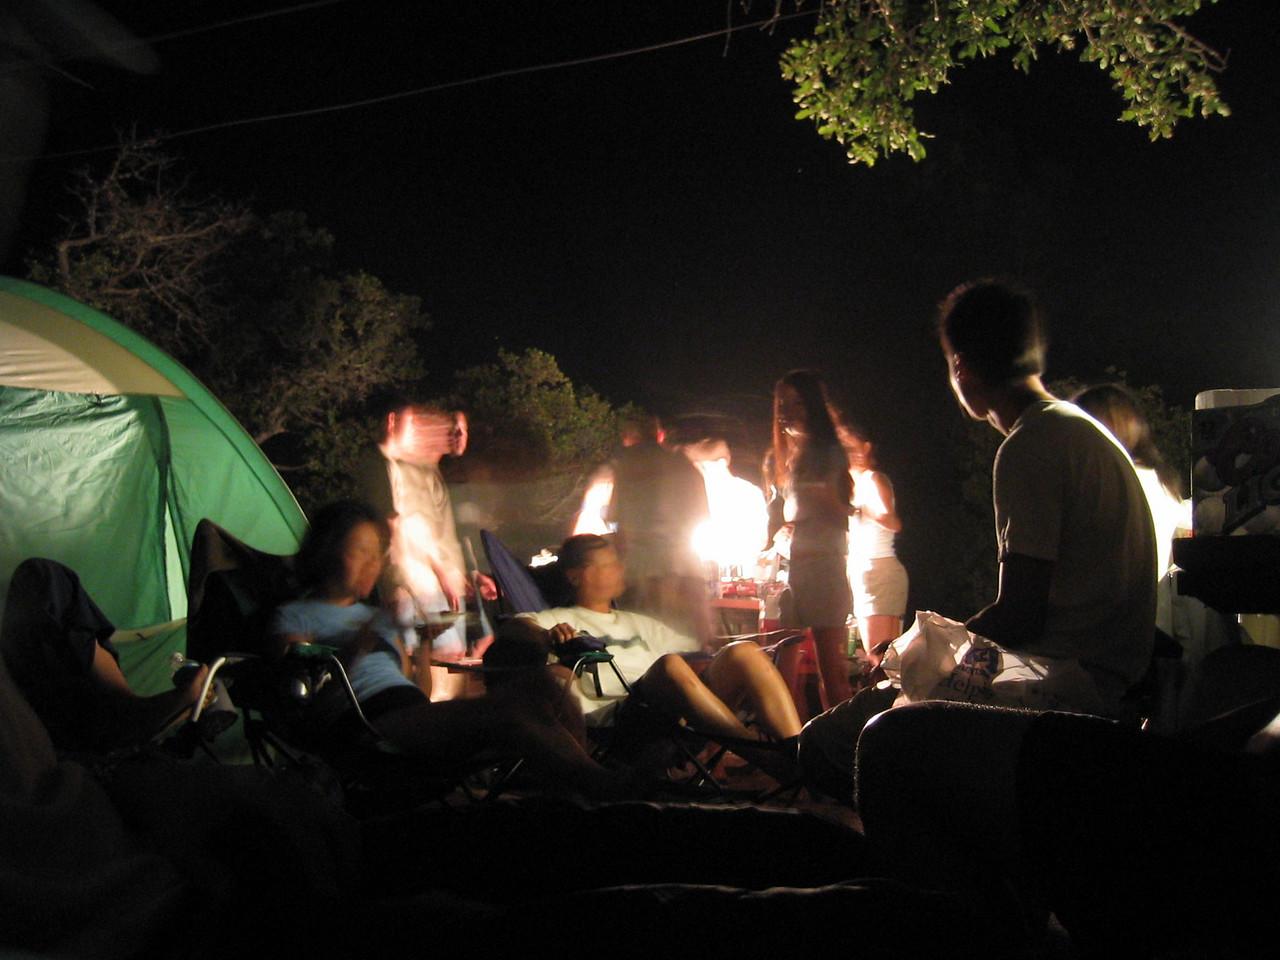 2003 08 16 Saturday - Lake Berryessa Trip, blurred food table and campsite